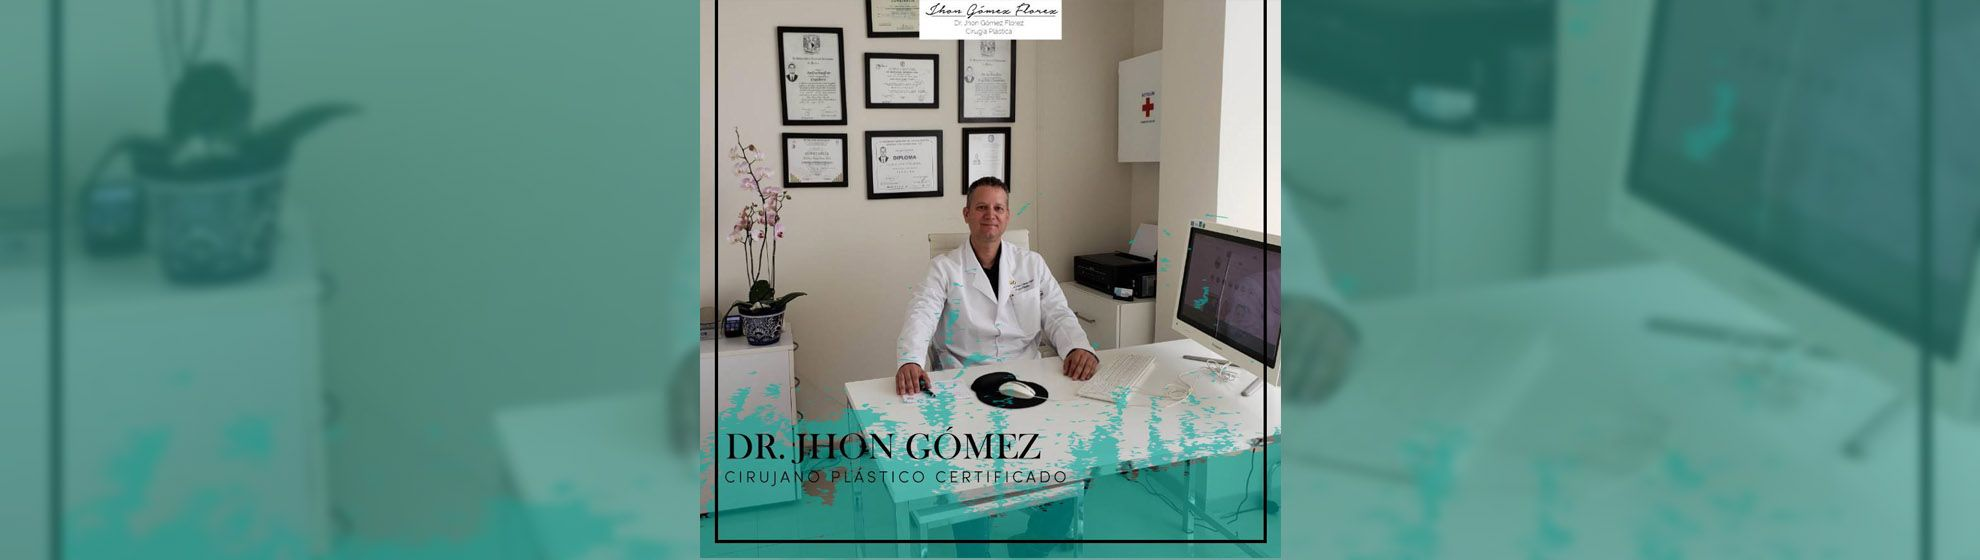 Dr. Jhon Gómez Cirujano Plástico